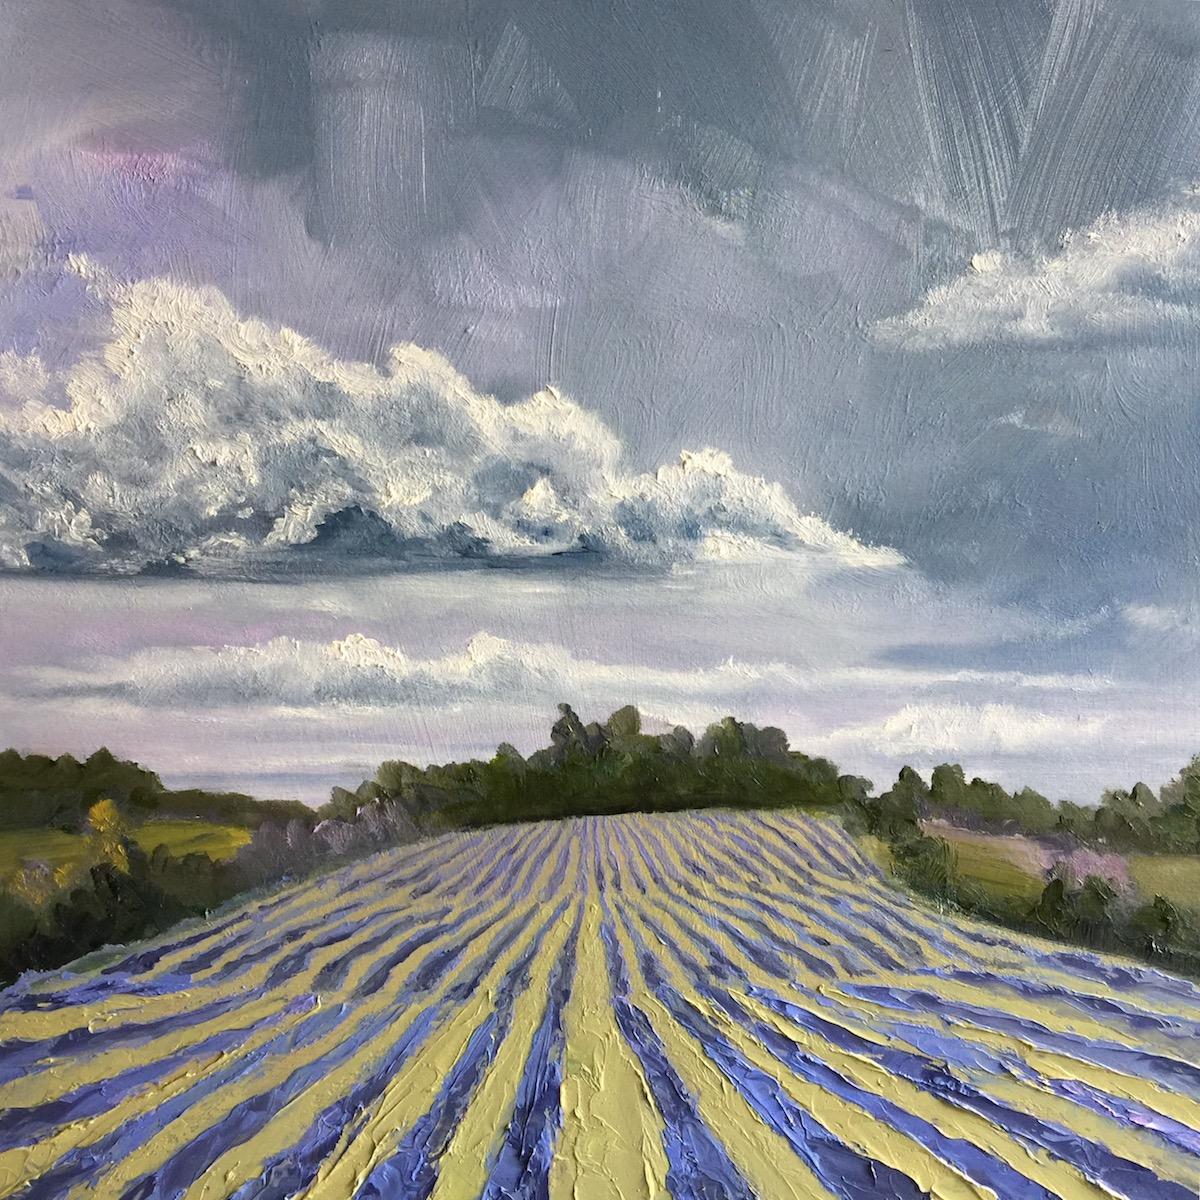 Blustone Vineyards - Painting by Stephanie Schlatter